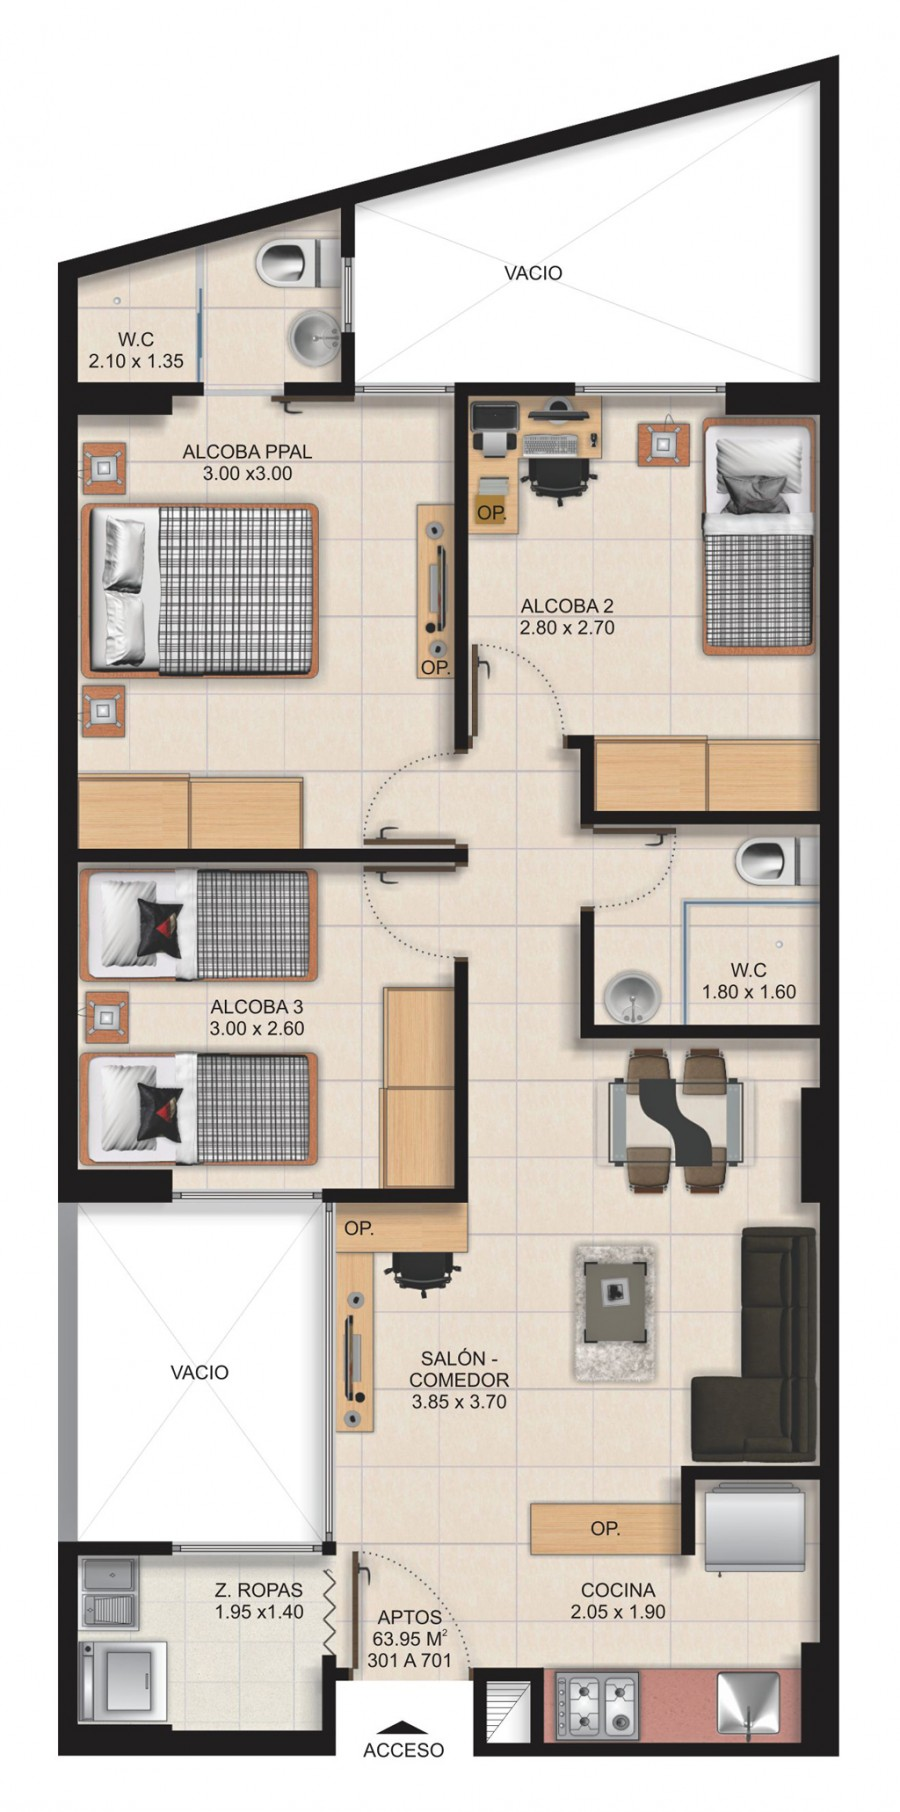 Planta Típica Apartamento Tipo A (63.95m2) Apartamentos San Arcangel